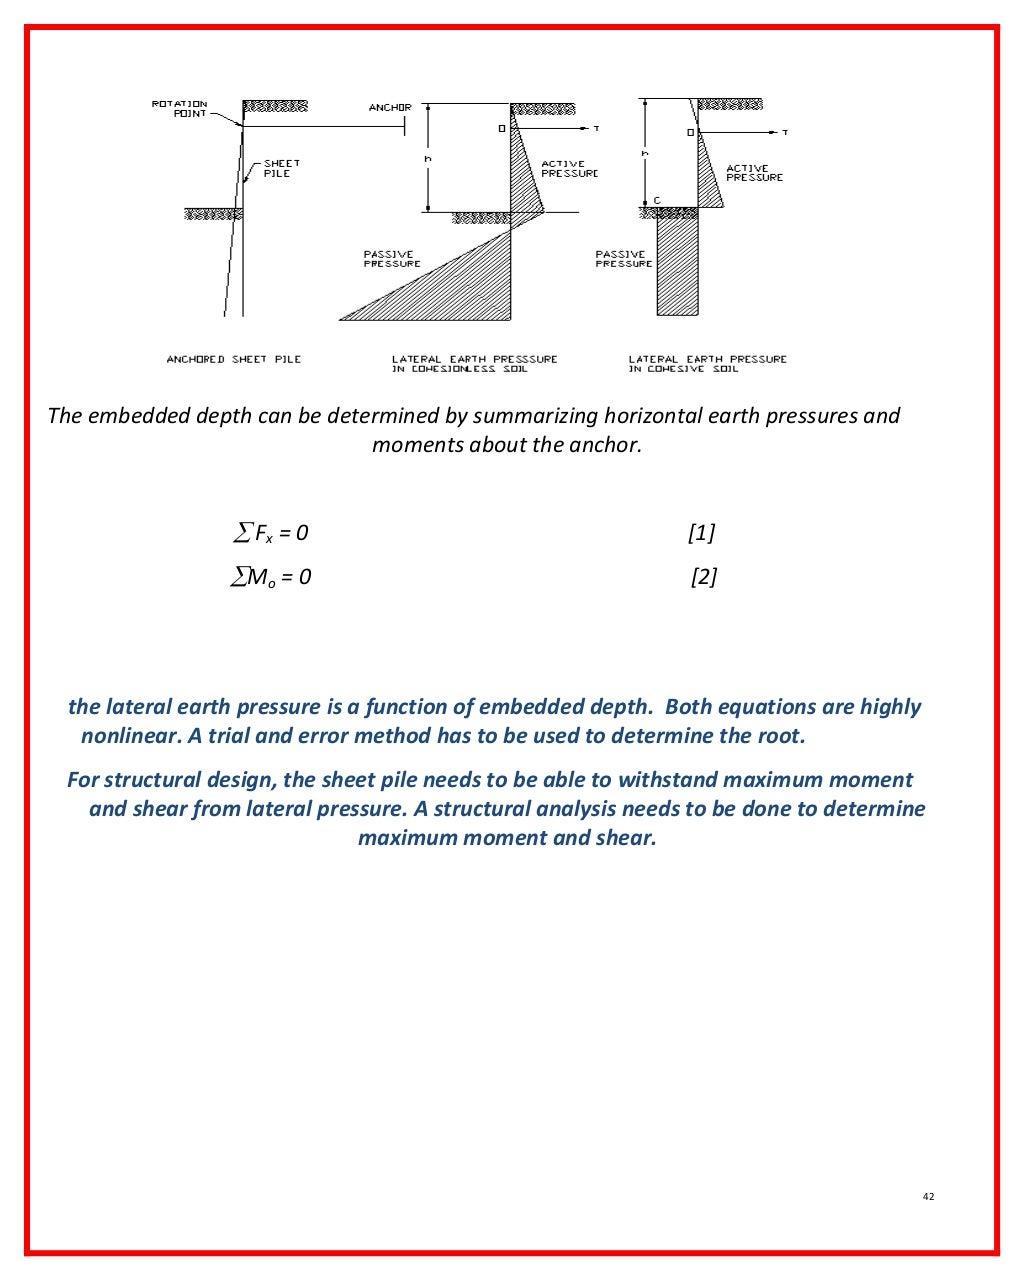 retaining-walls-steel-sheet-piles-sheet-piles-wall-42-1024.jpg